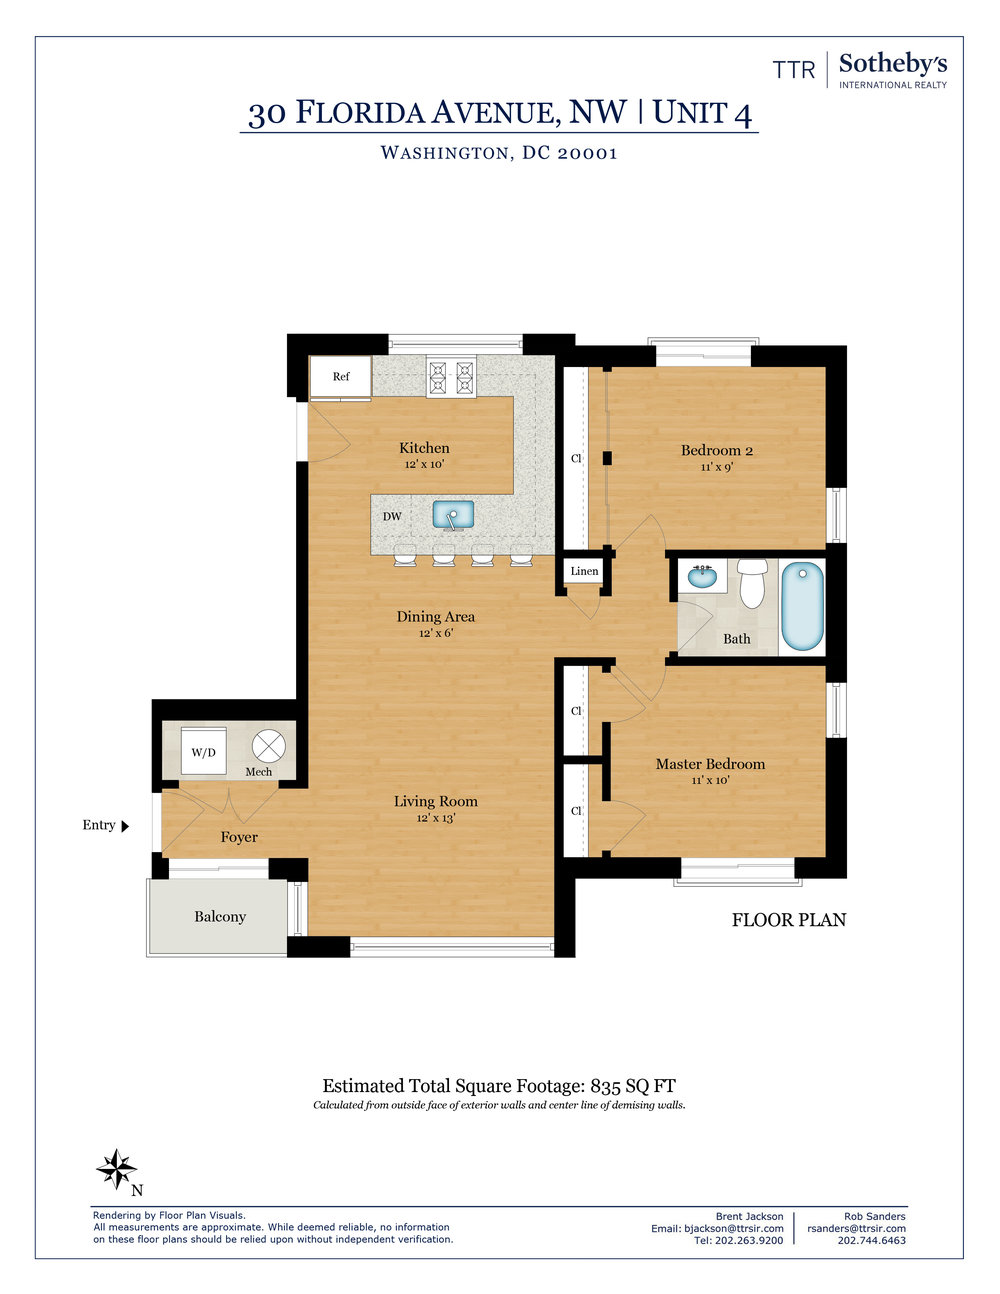 BJ-30FloridaAveNW#4-FloorPlan-Print-R1.jpg